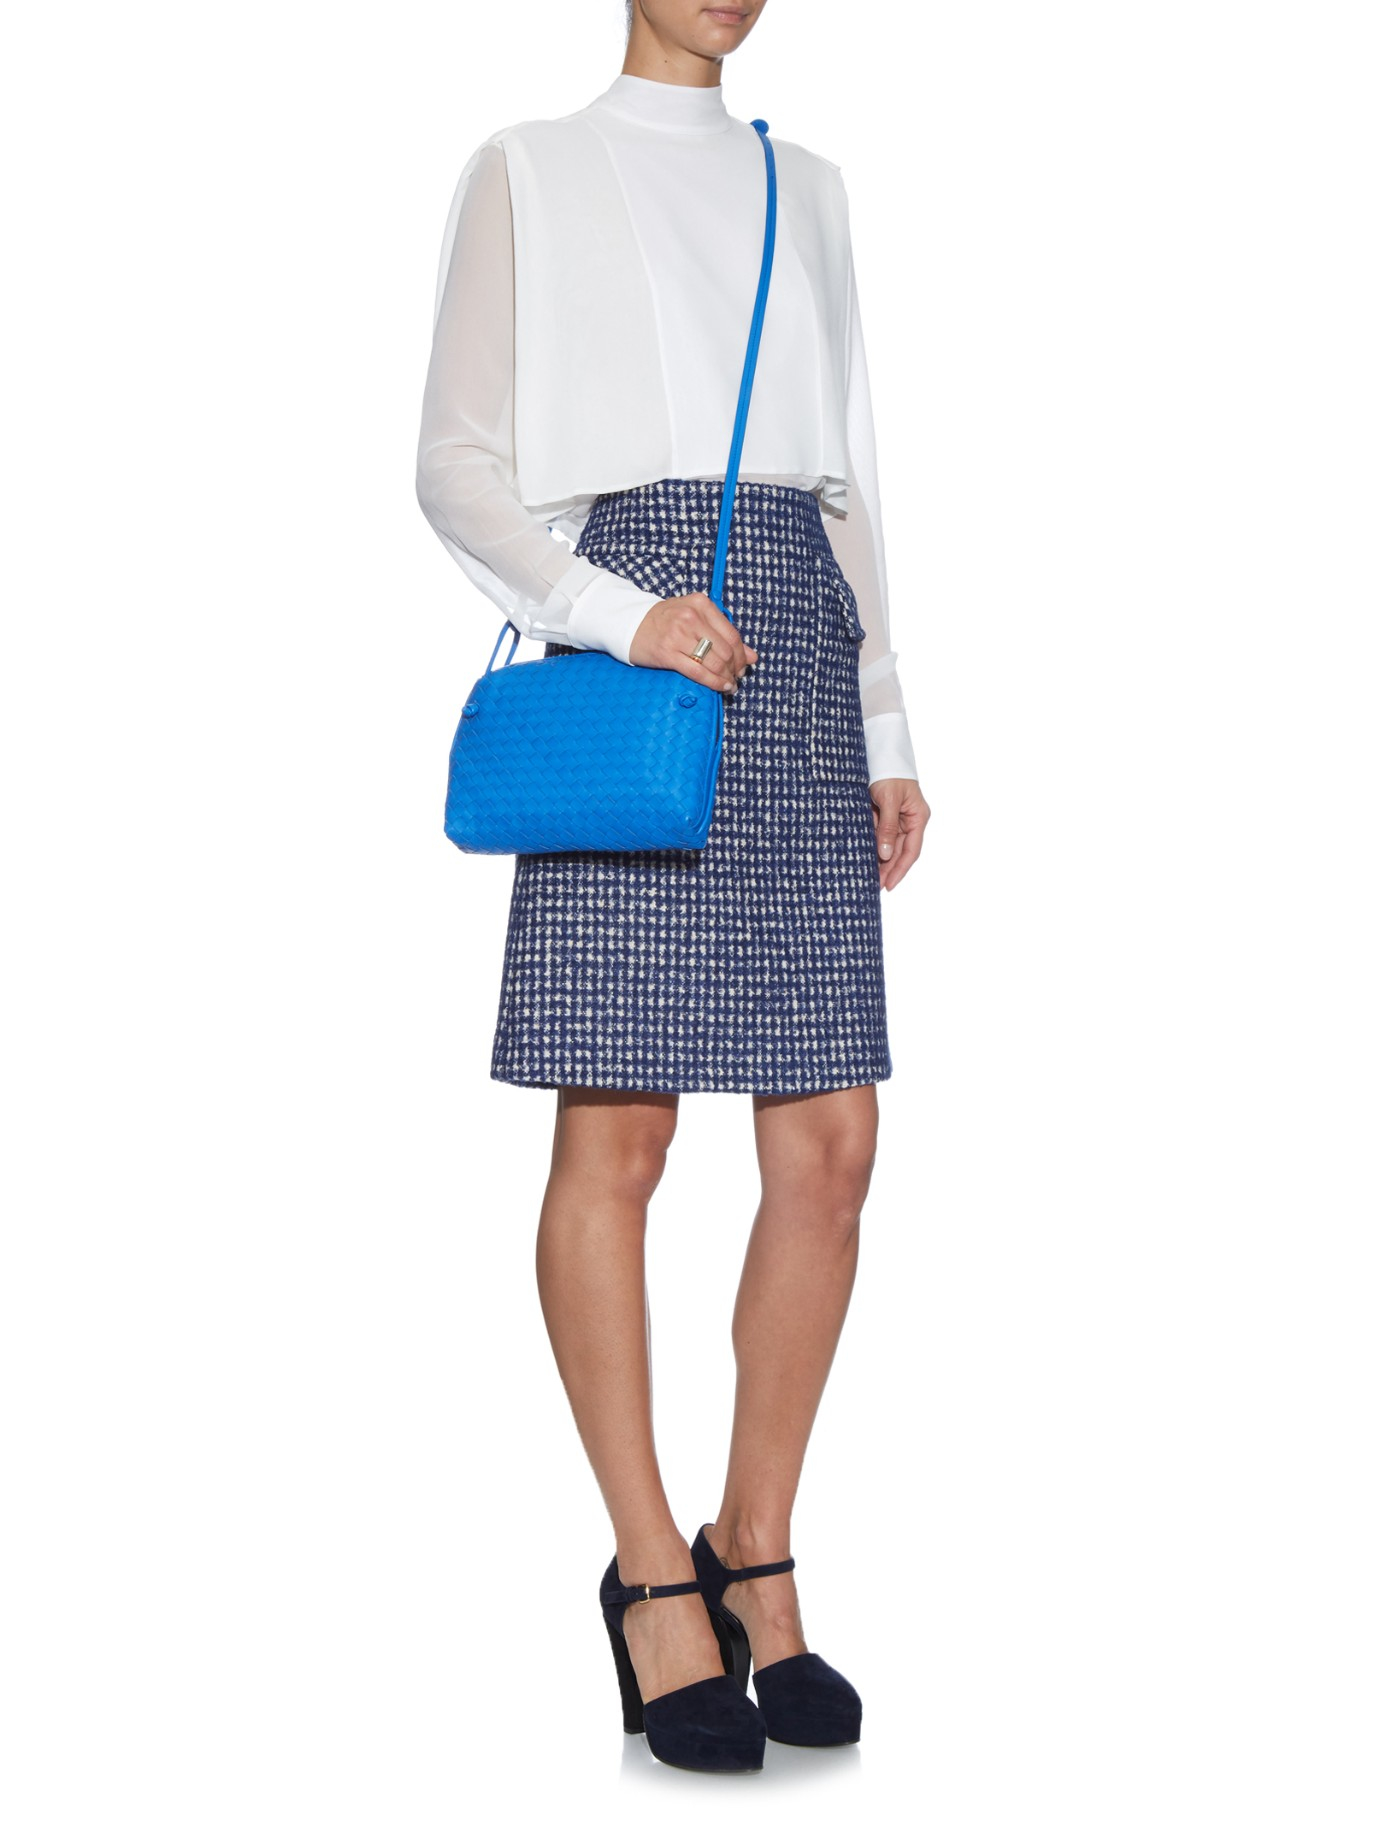 2b8668717f Bottega Veneta Nodini Intrecciato Leather Cross-Body Bag in Blue - Lyst